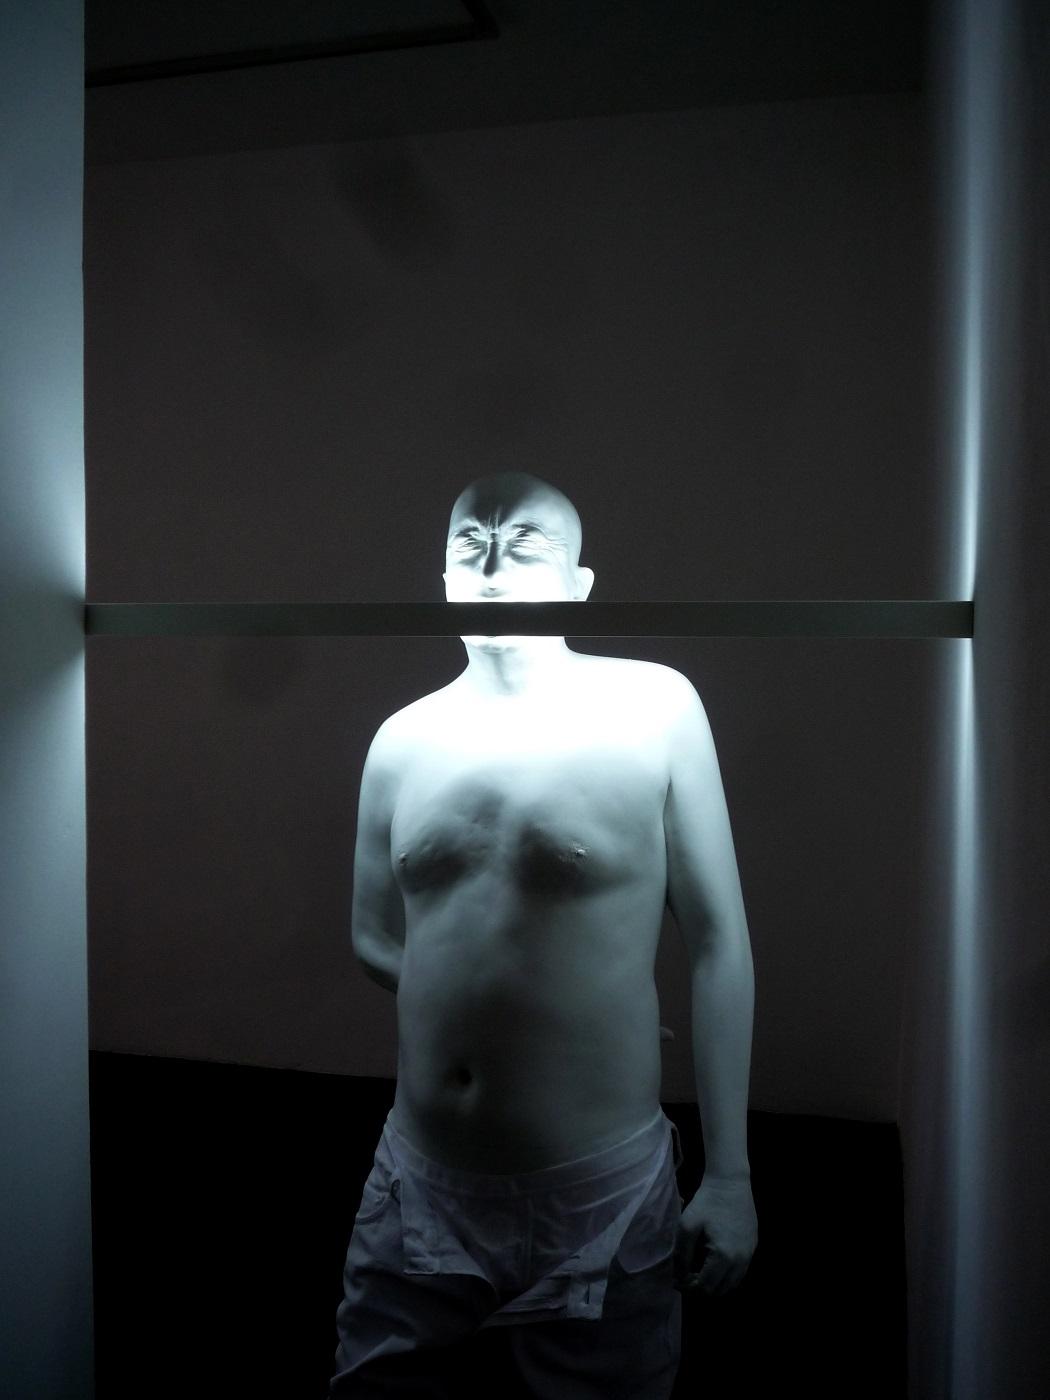 Intuition, Palazzo Fortuny, Venezia - Bernardi Roig, An Illuminated Head for Blinky P., 2010 Resina di poliestere polvere di marmo, luce fluorescente, 177,8x64,77x30,48 cm Courtesy Galerie KEWENIG, Berlin, Palma. © Silvia León